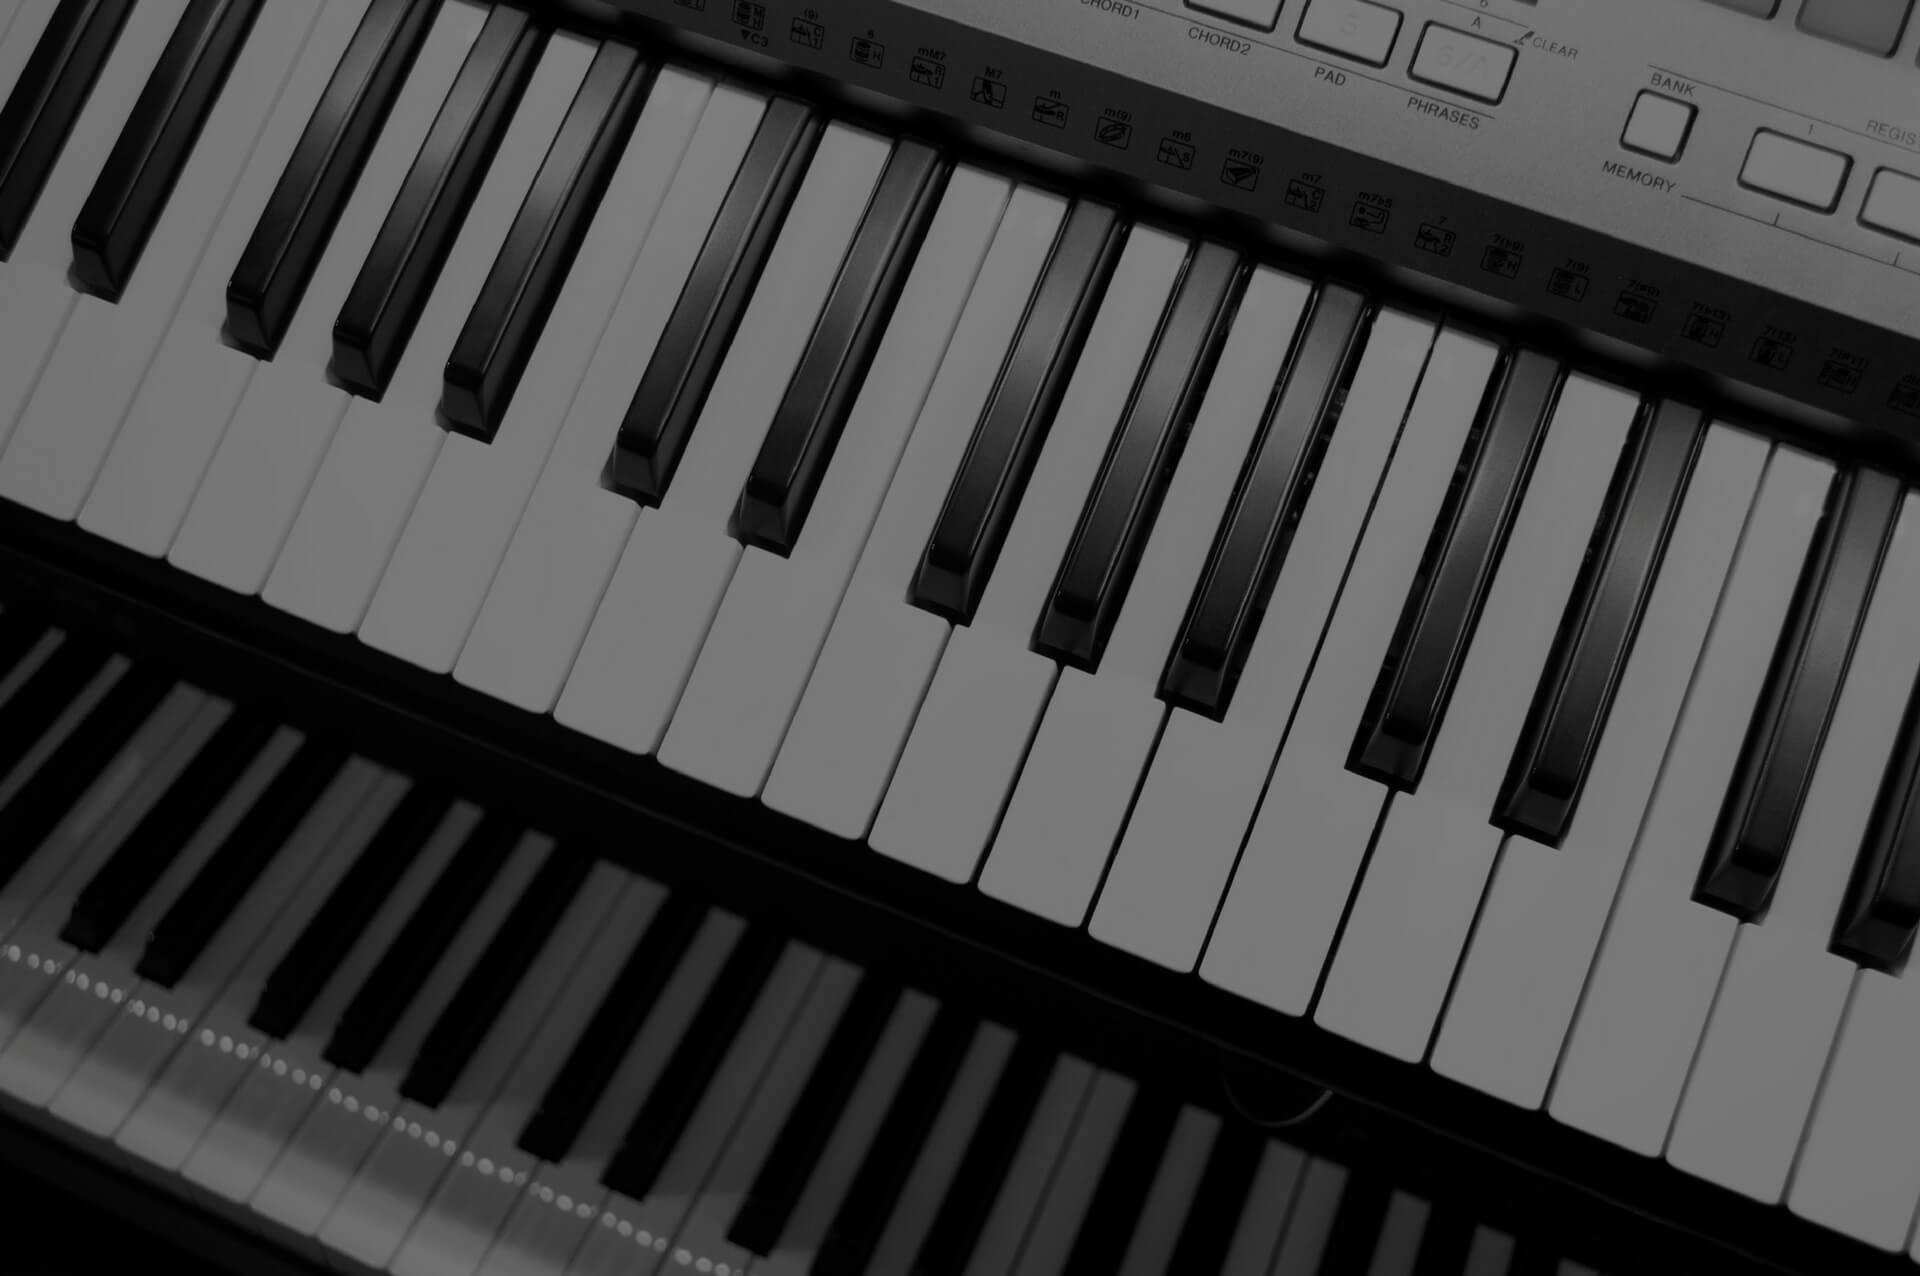 Andi Herzog - Audio Freelancer - Musikproduzent - Beats